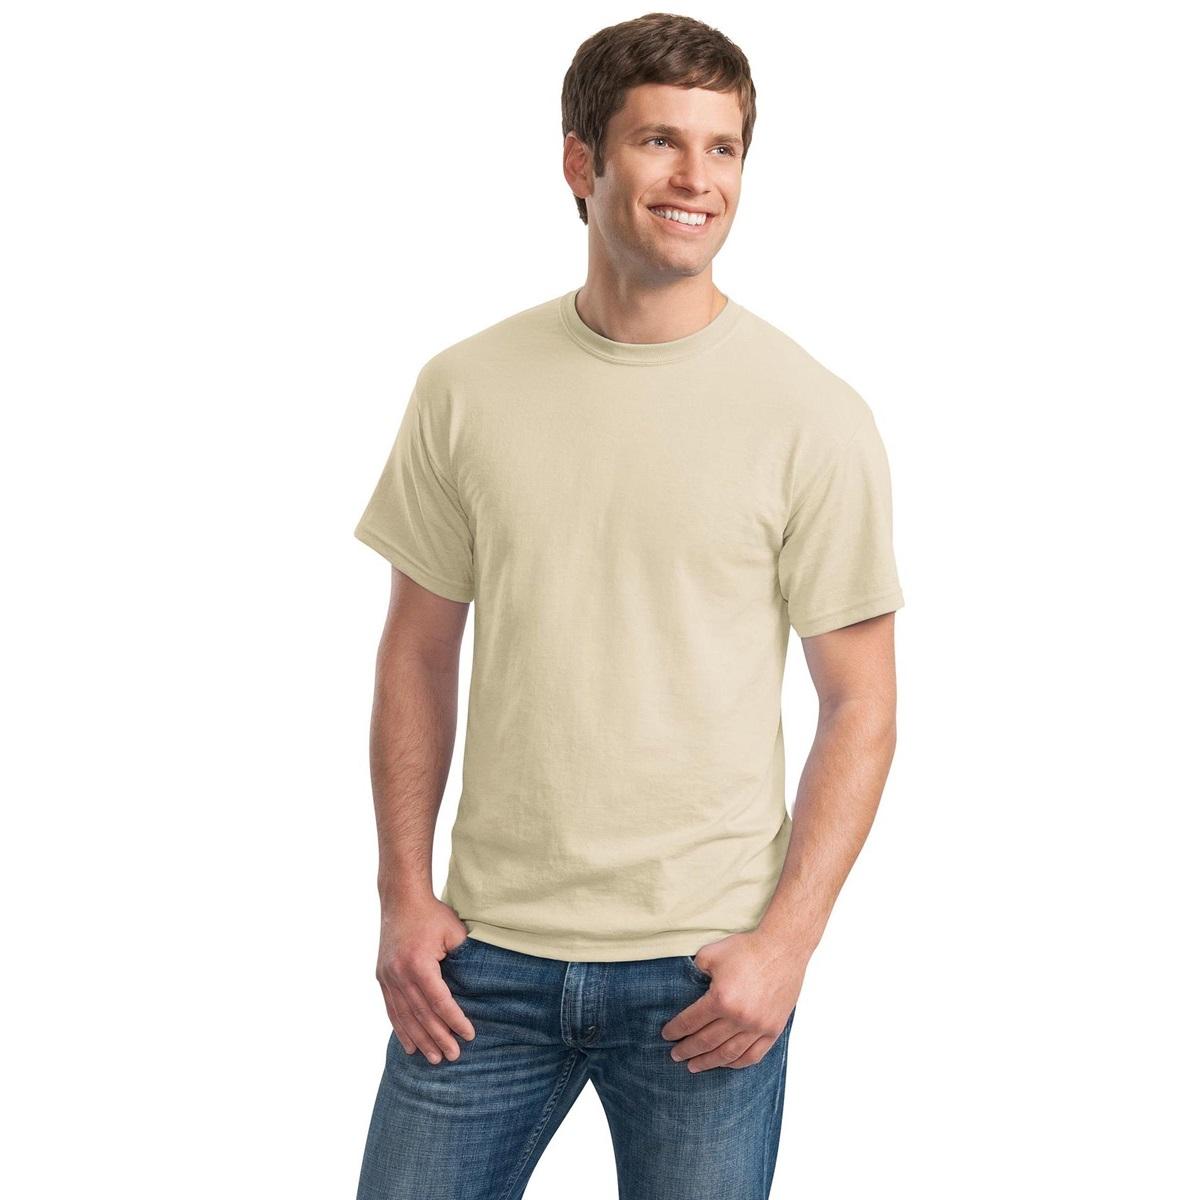 Gildan 8000 dryblend t shirt sand for Gildan 8000 t shirt